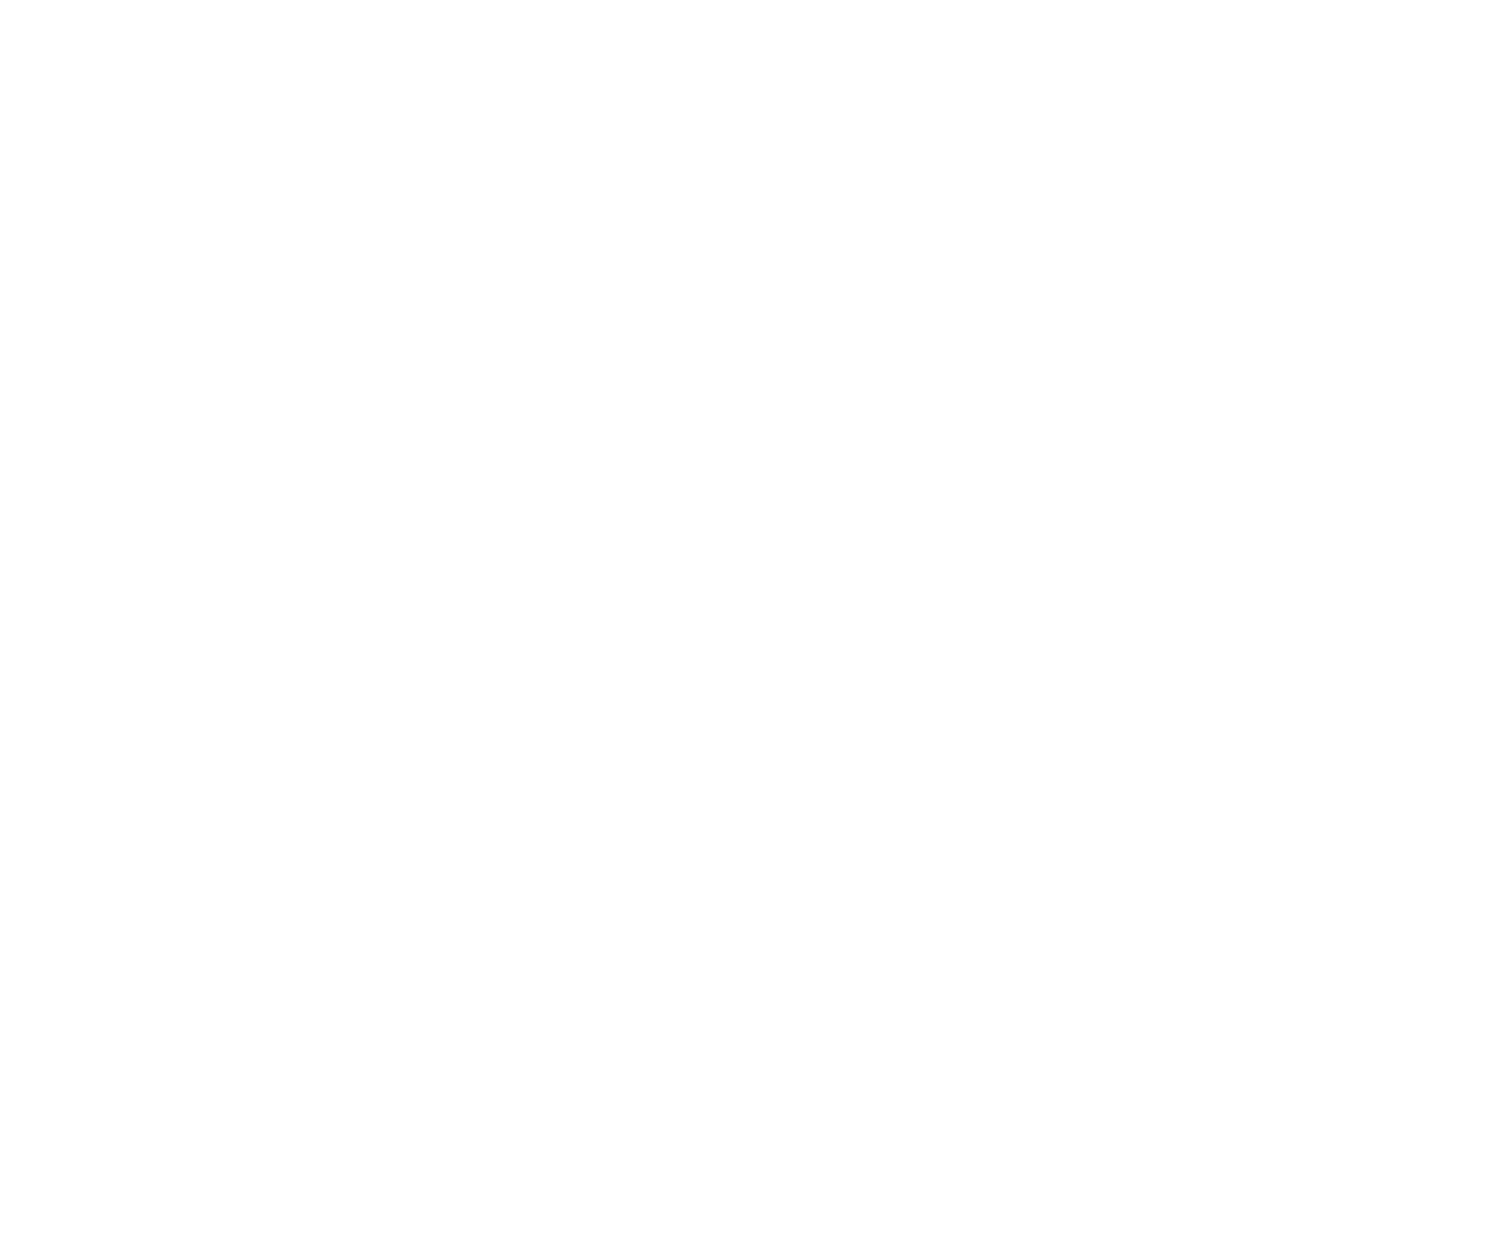 Vulvar Intraepithelial Neoplasia (VIN)